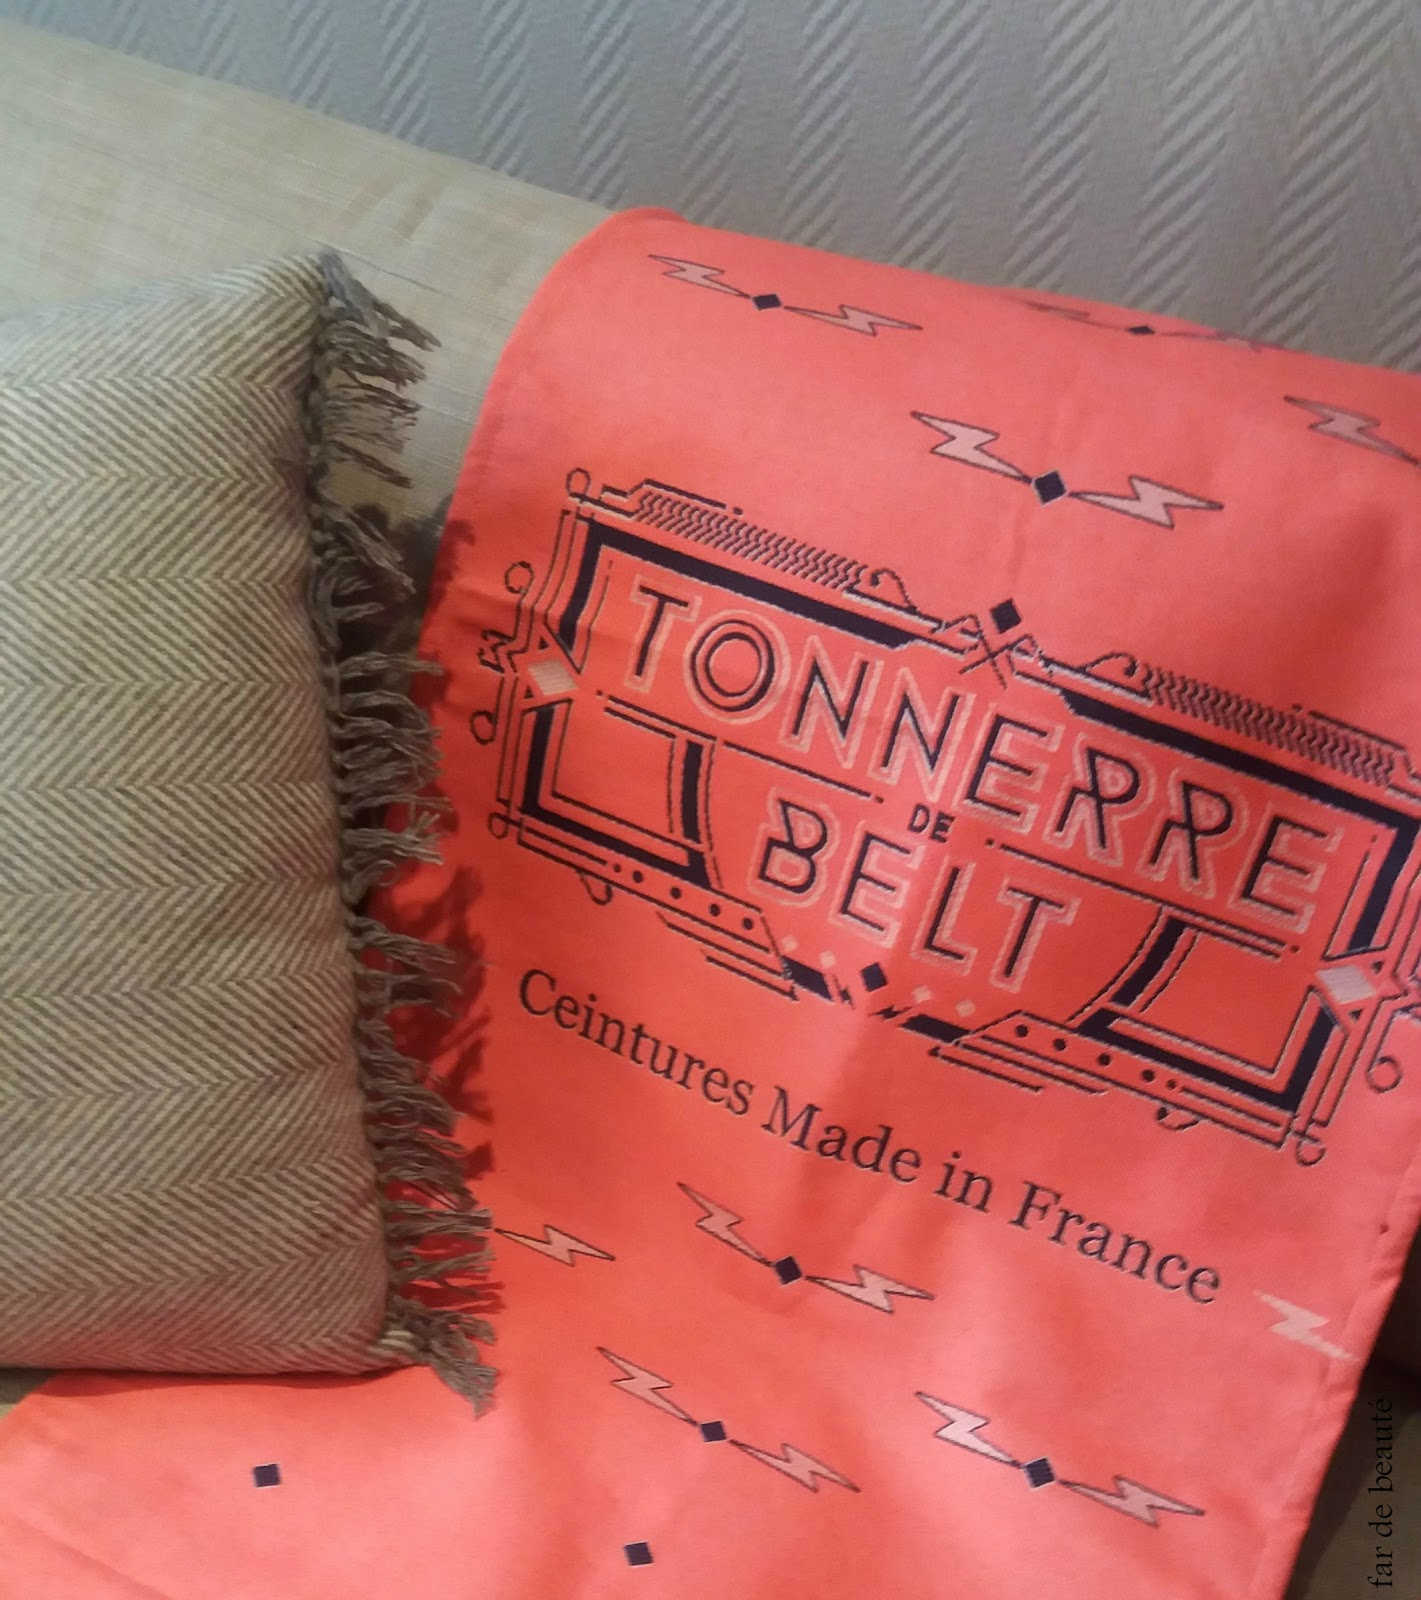 38c35a69cd80 Tonnerre De Belt   les ceintures Made In France